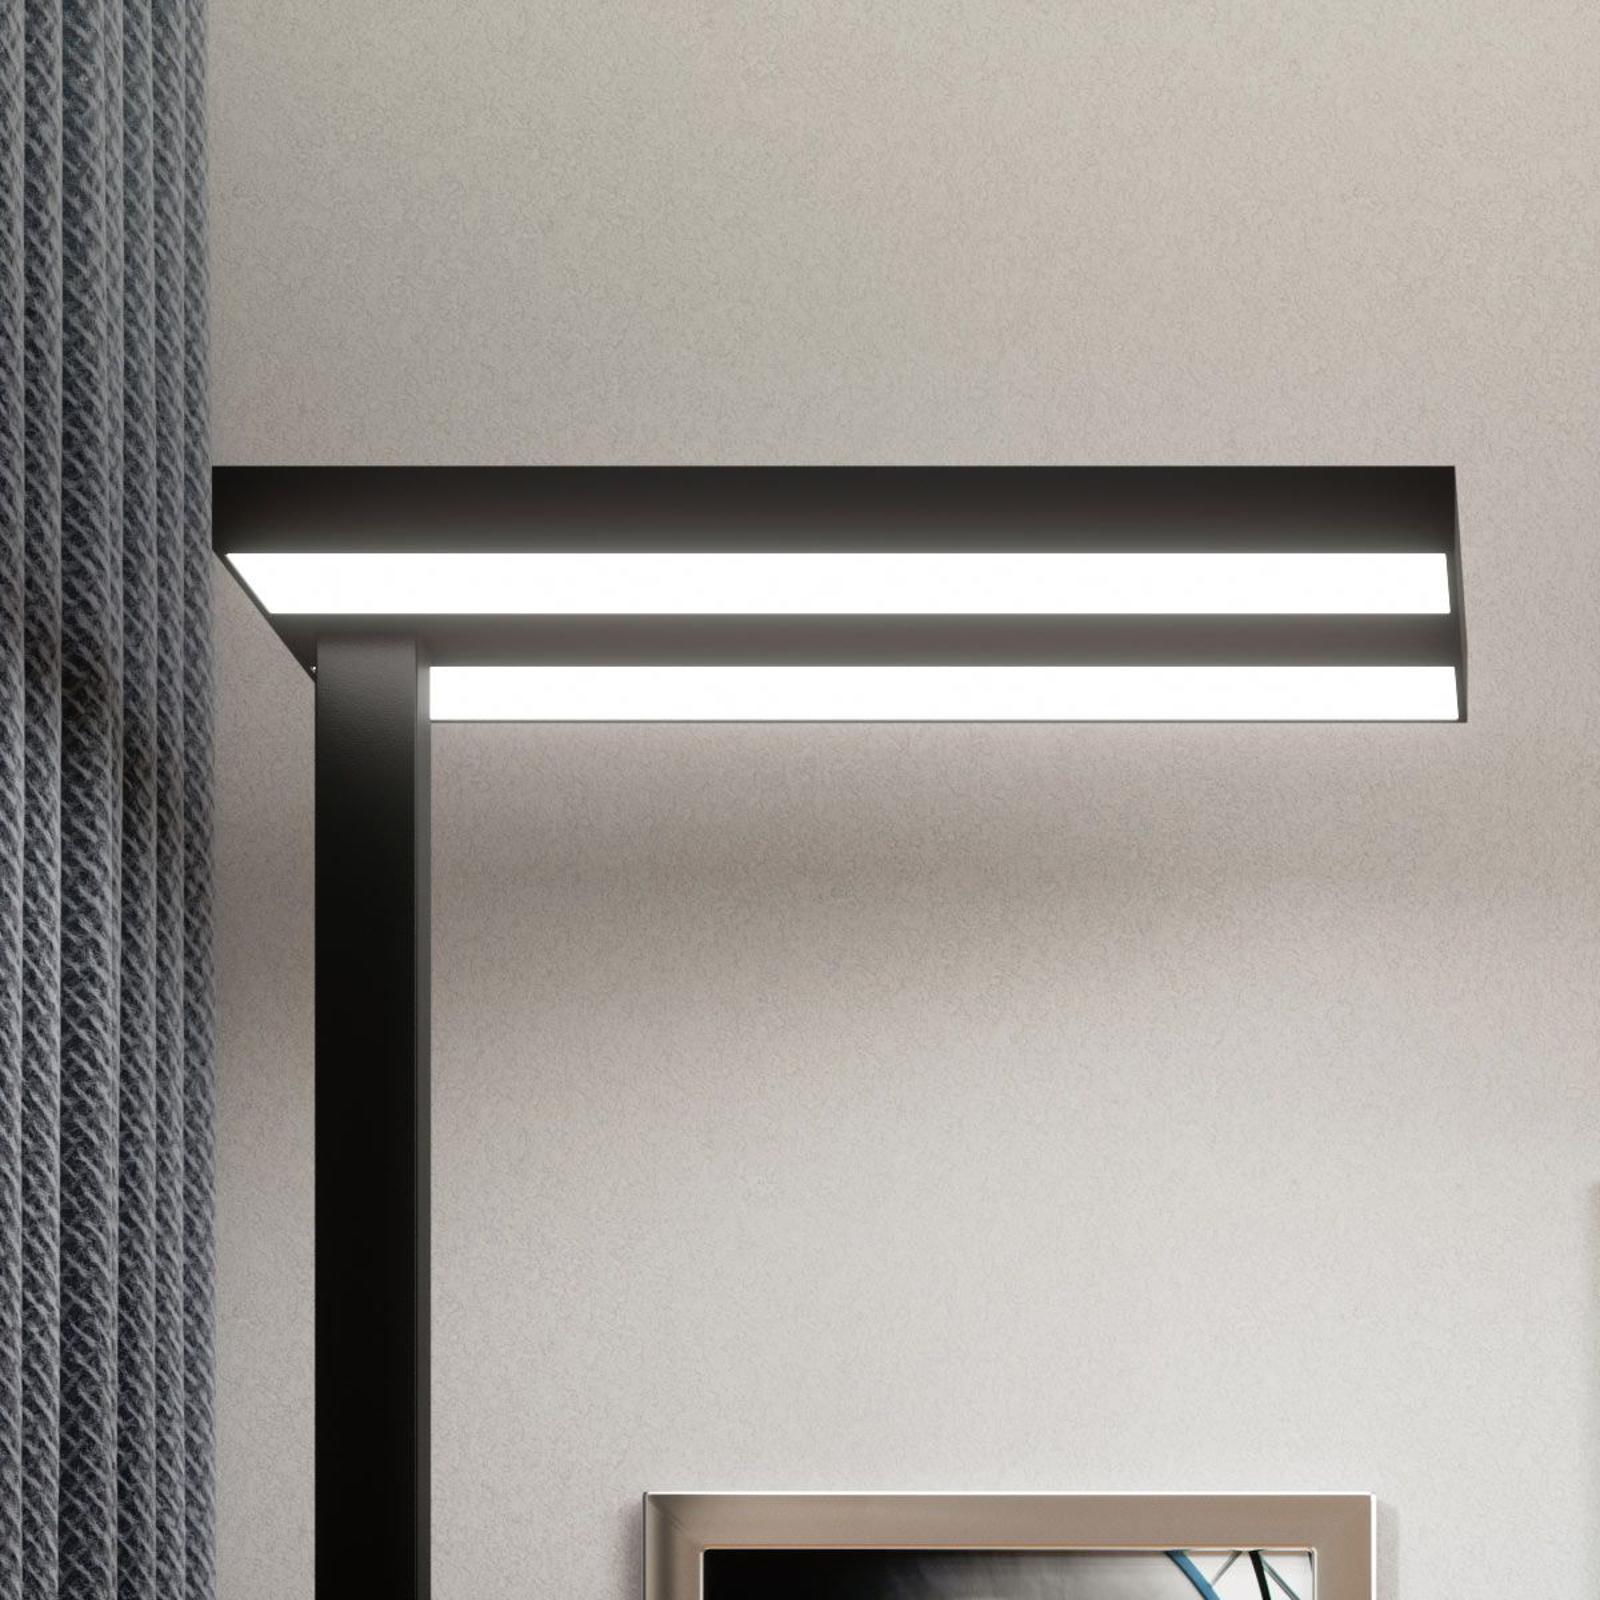 Lampada da pavimento LED da ufficio Logan nera